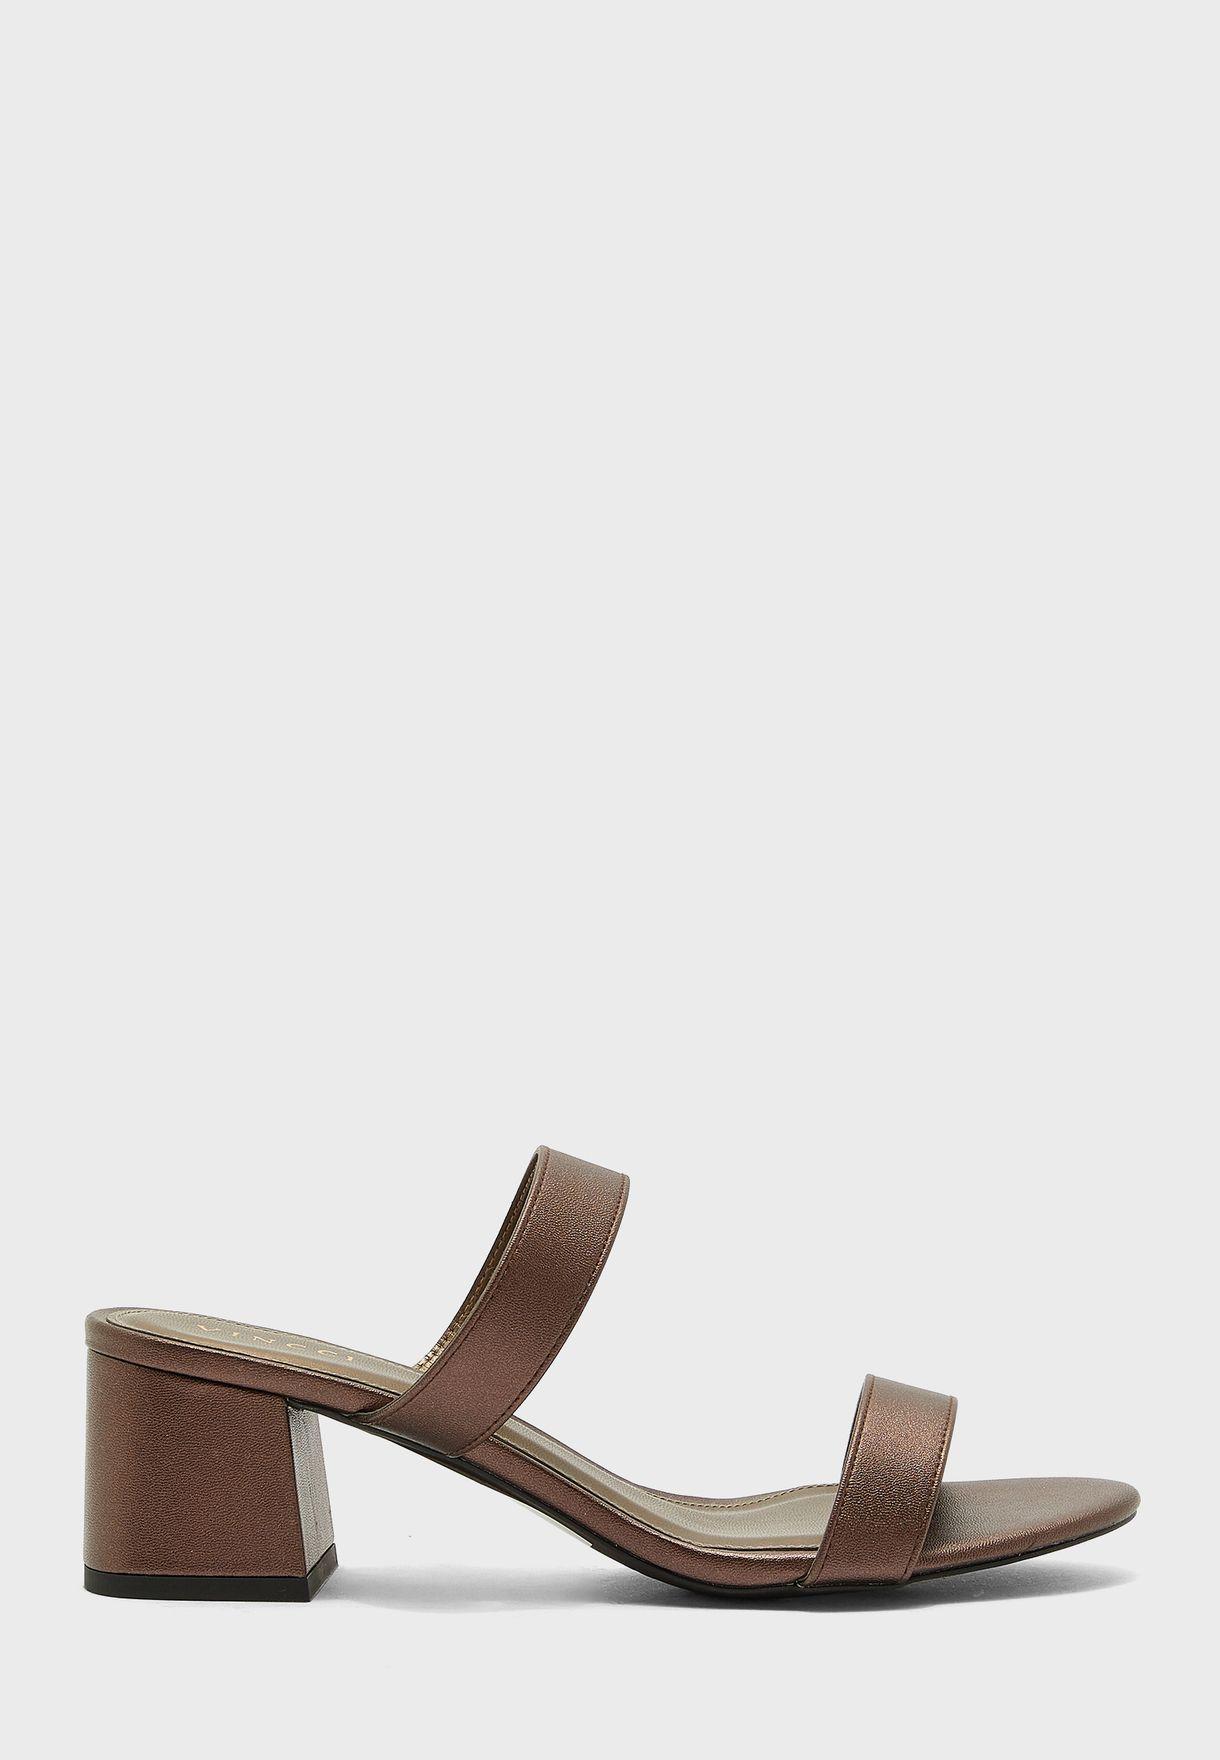 Double Strap Mid Heel Sandal